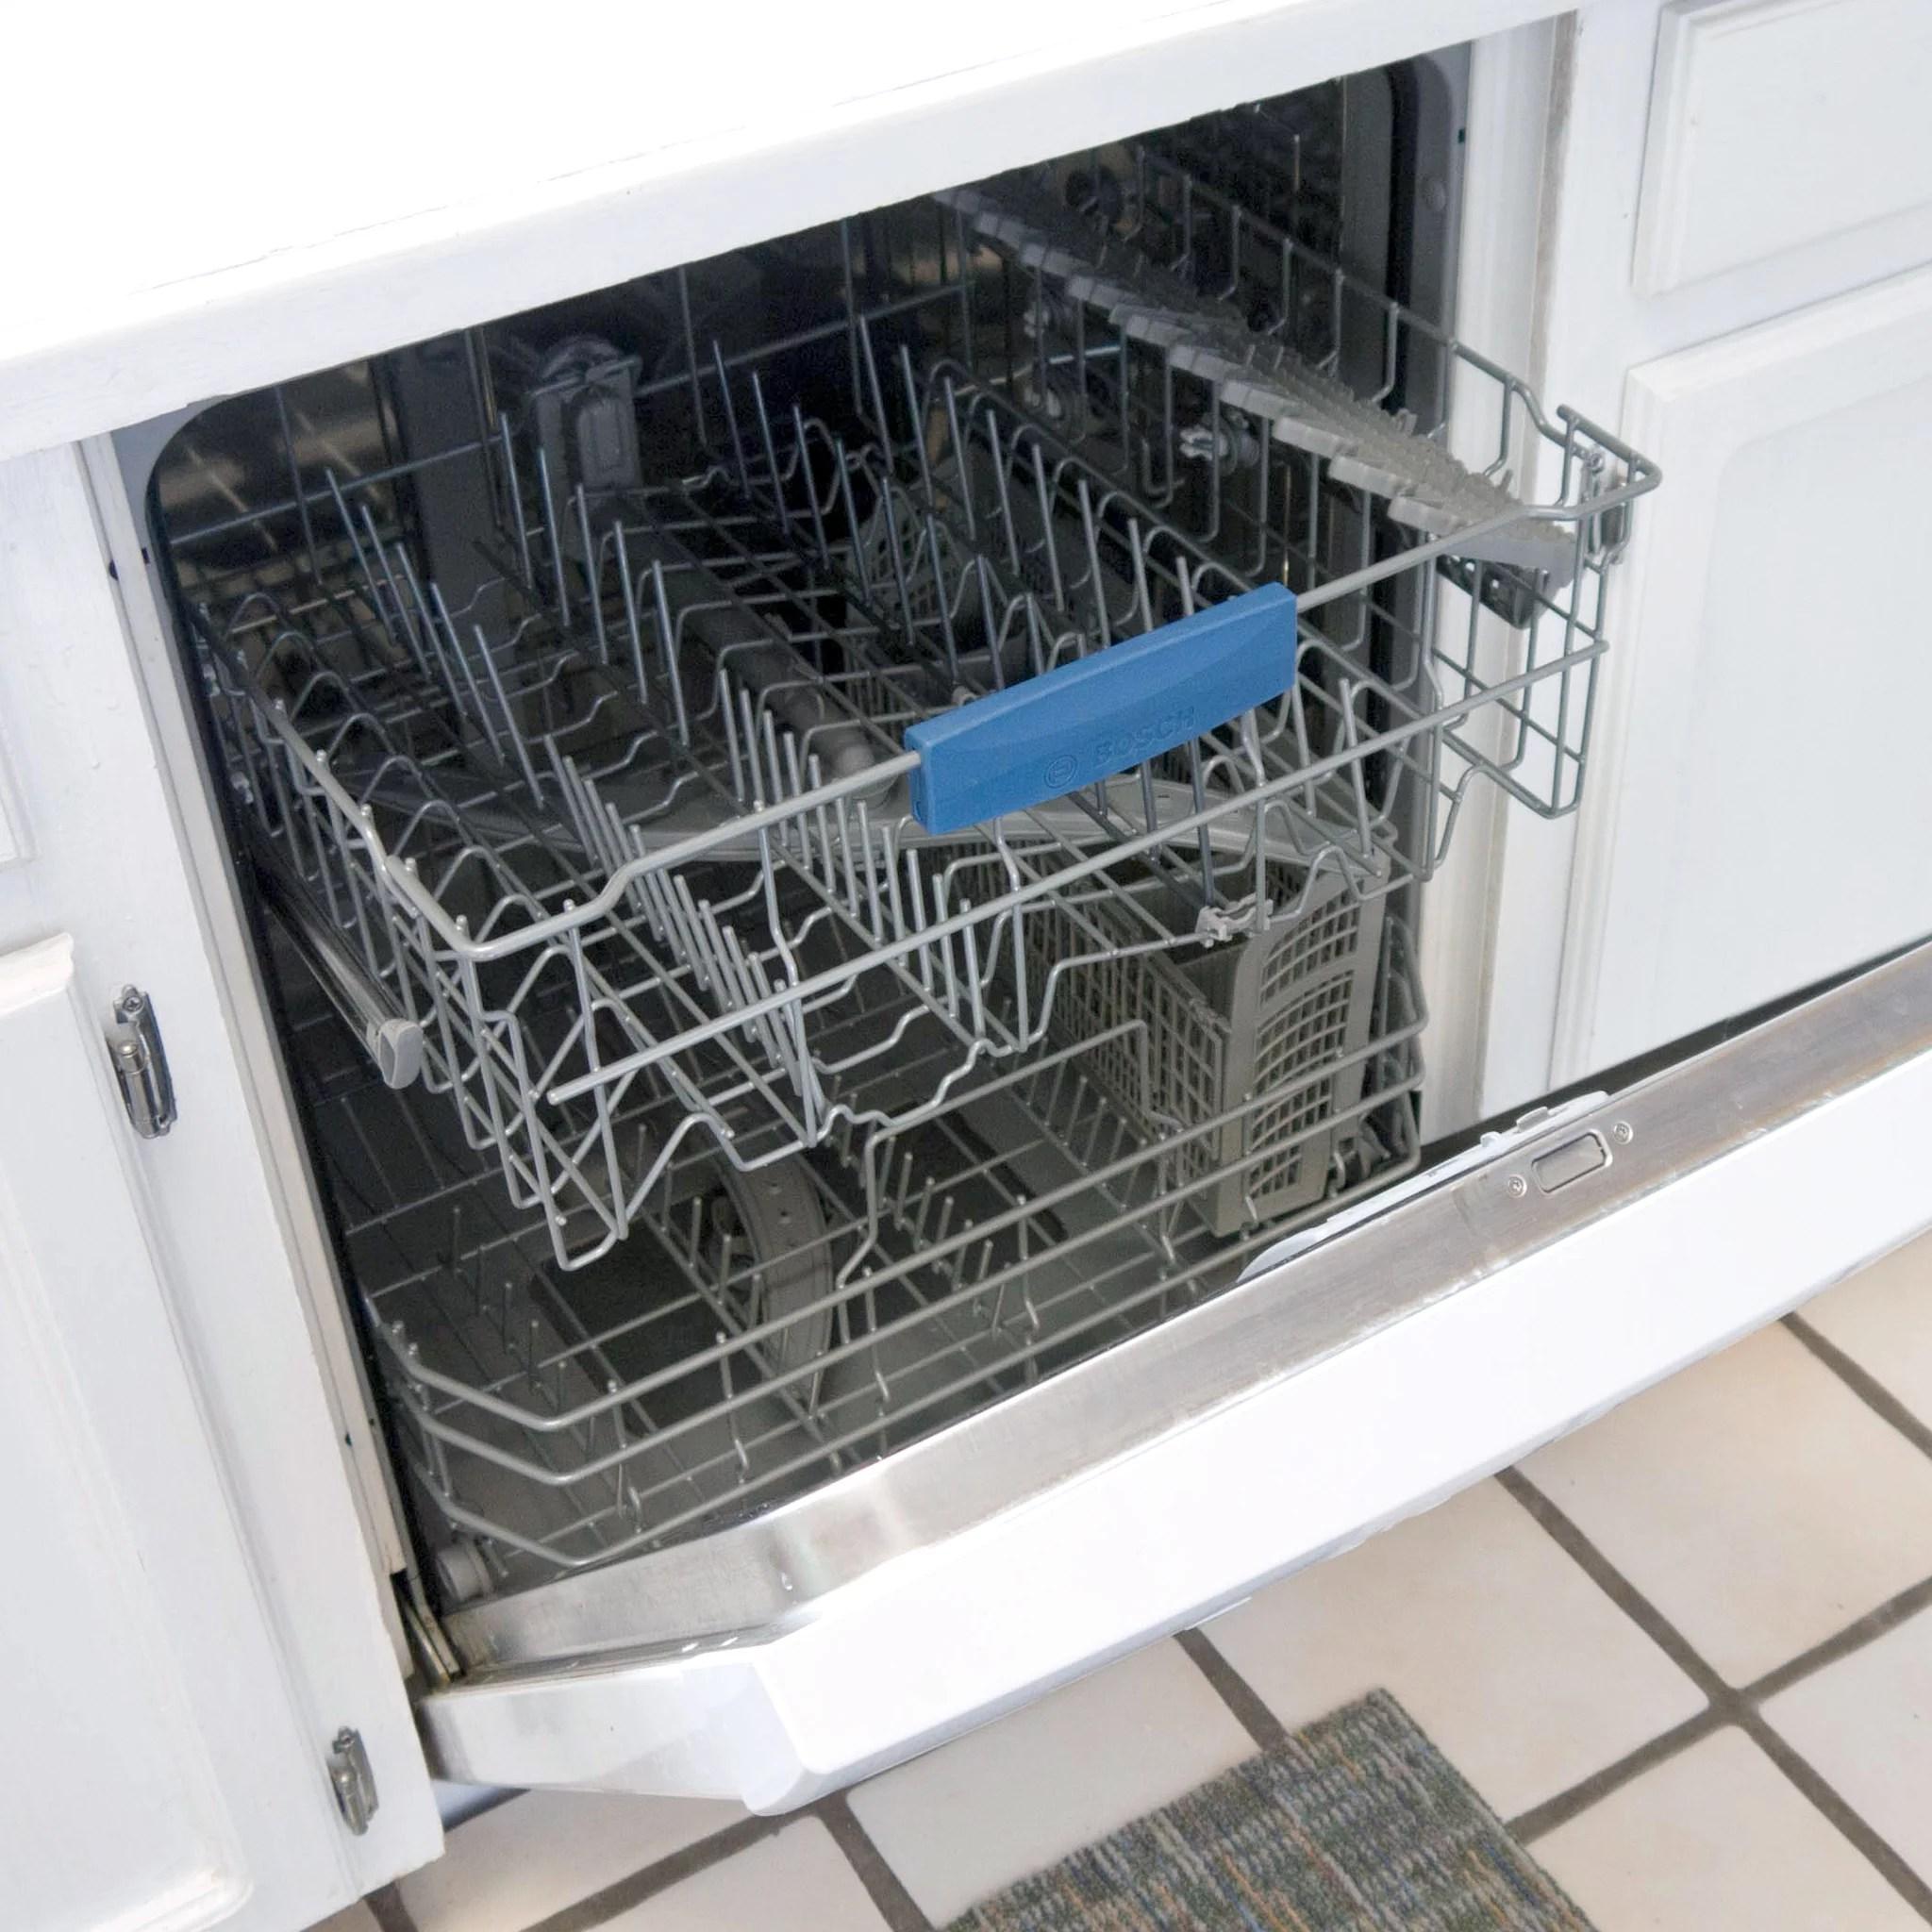 Fullsize Of Mold In Dishwasher